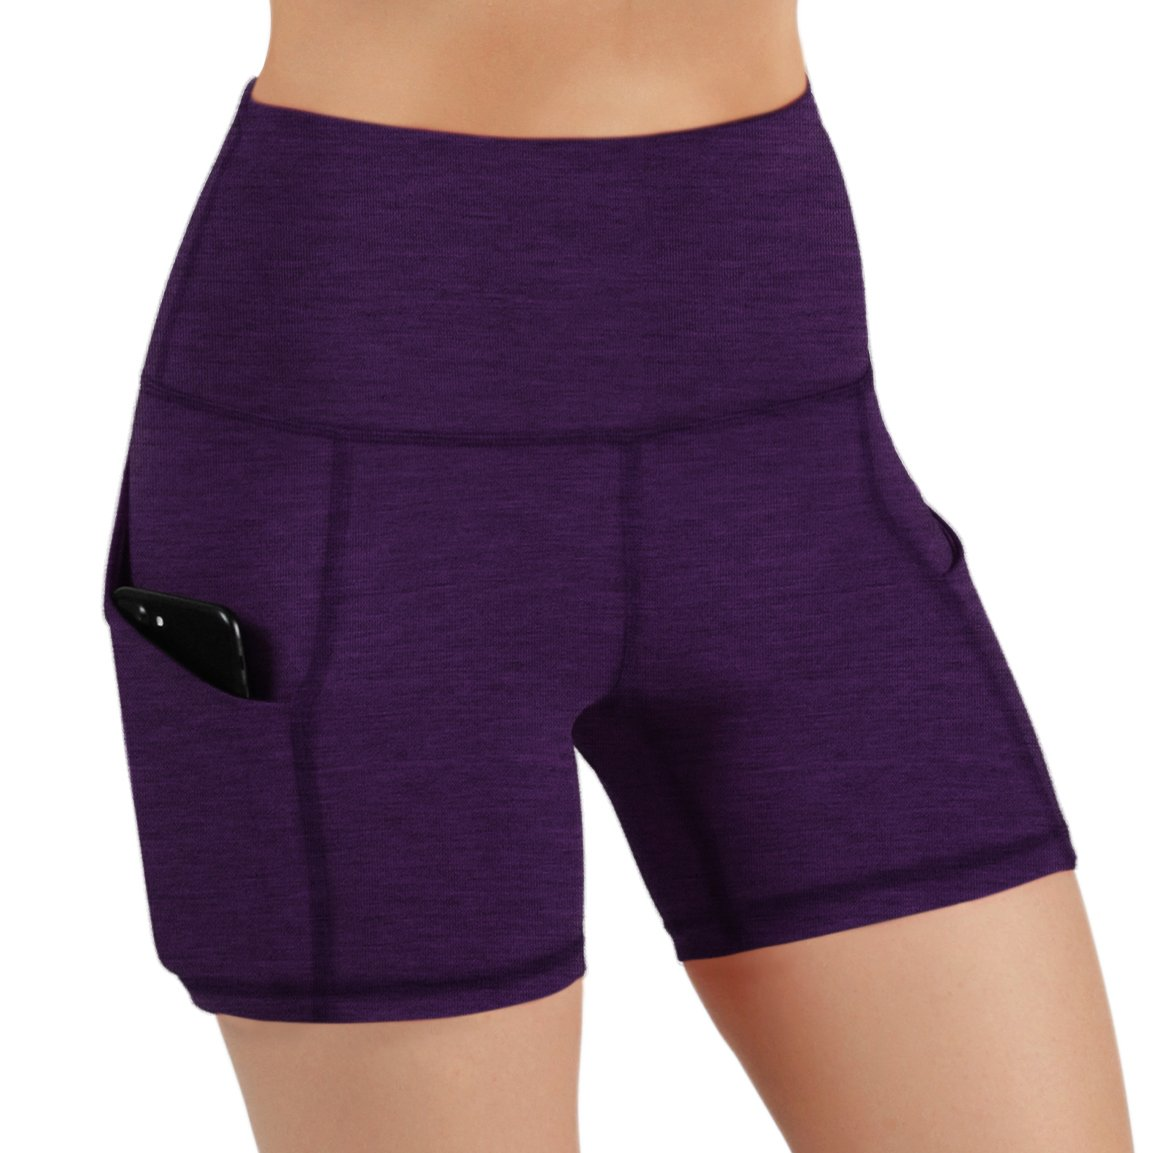 ODODOS High Waist Out Pocket Yoga Short Tummy Control Workout Running Athletic Non See-Through Yoga Shorts,DeepPurple,X-Small